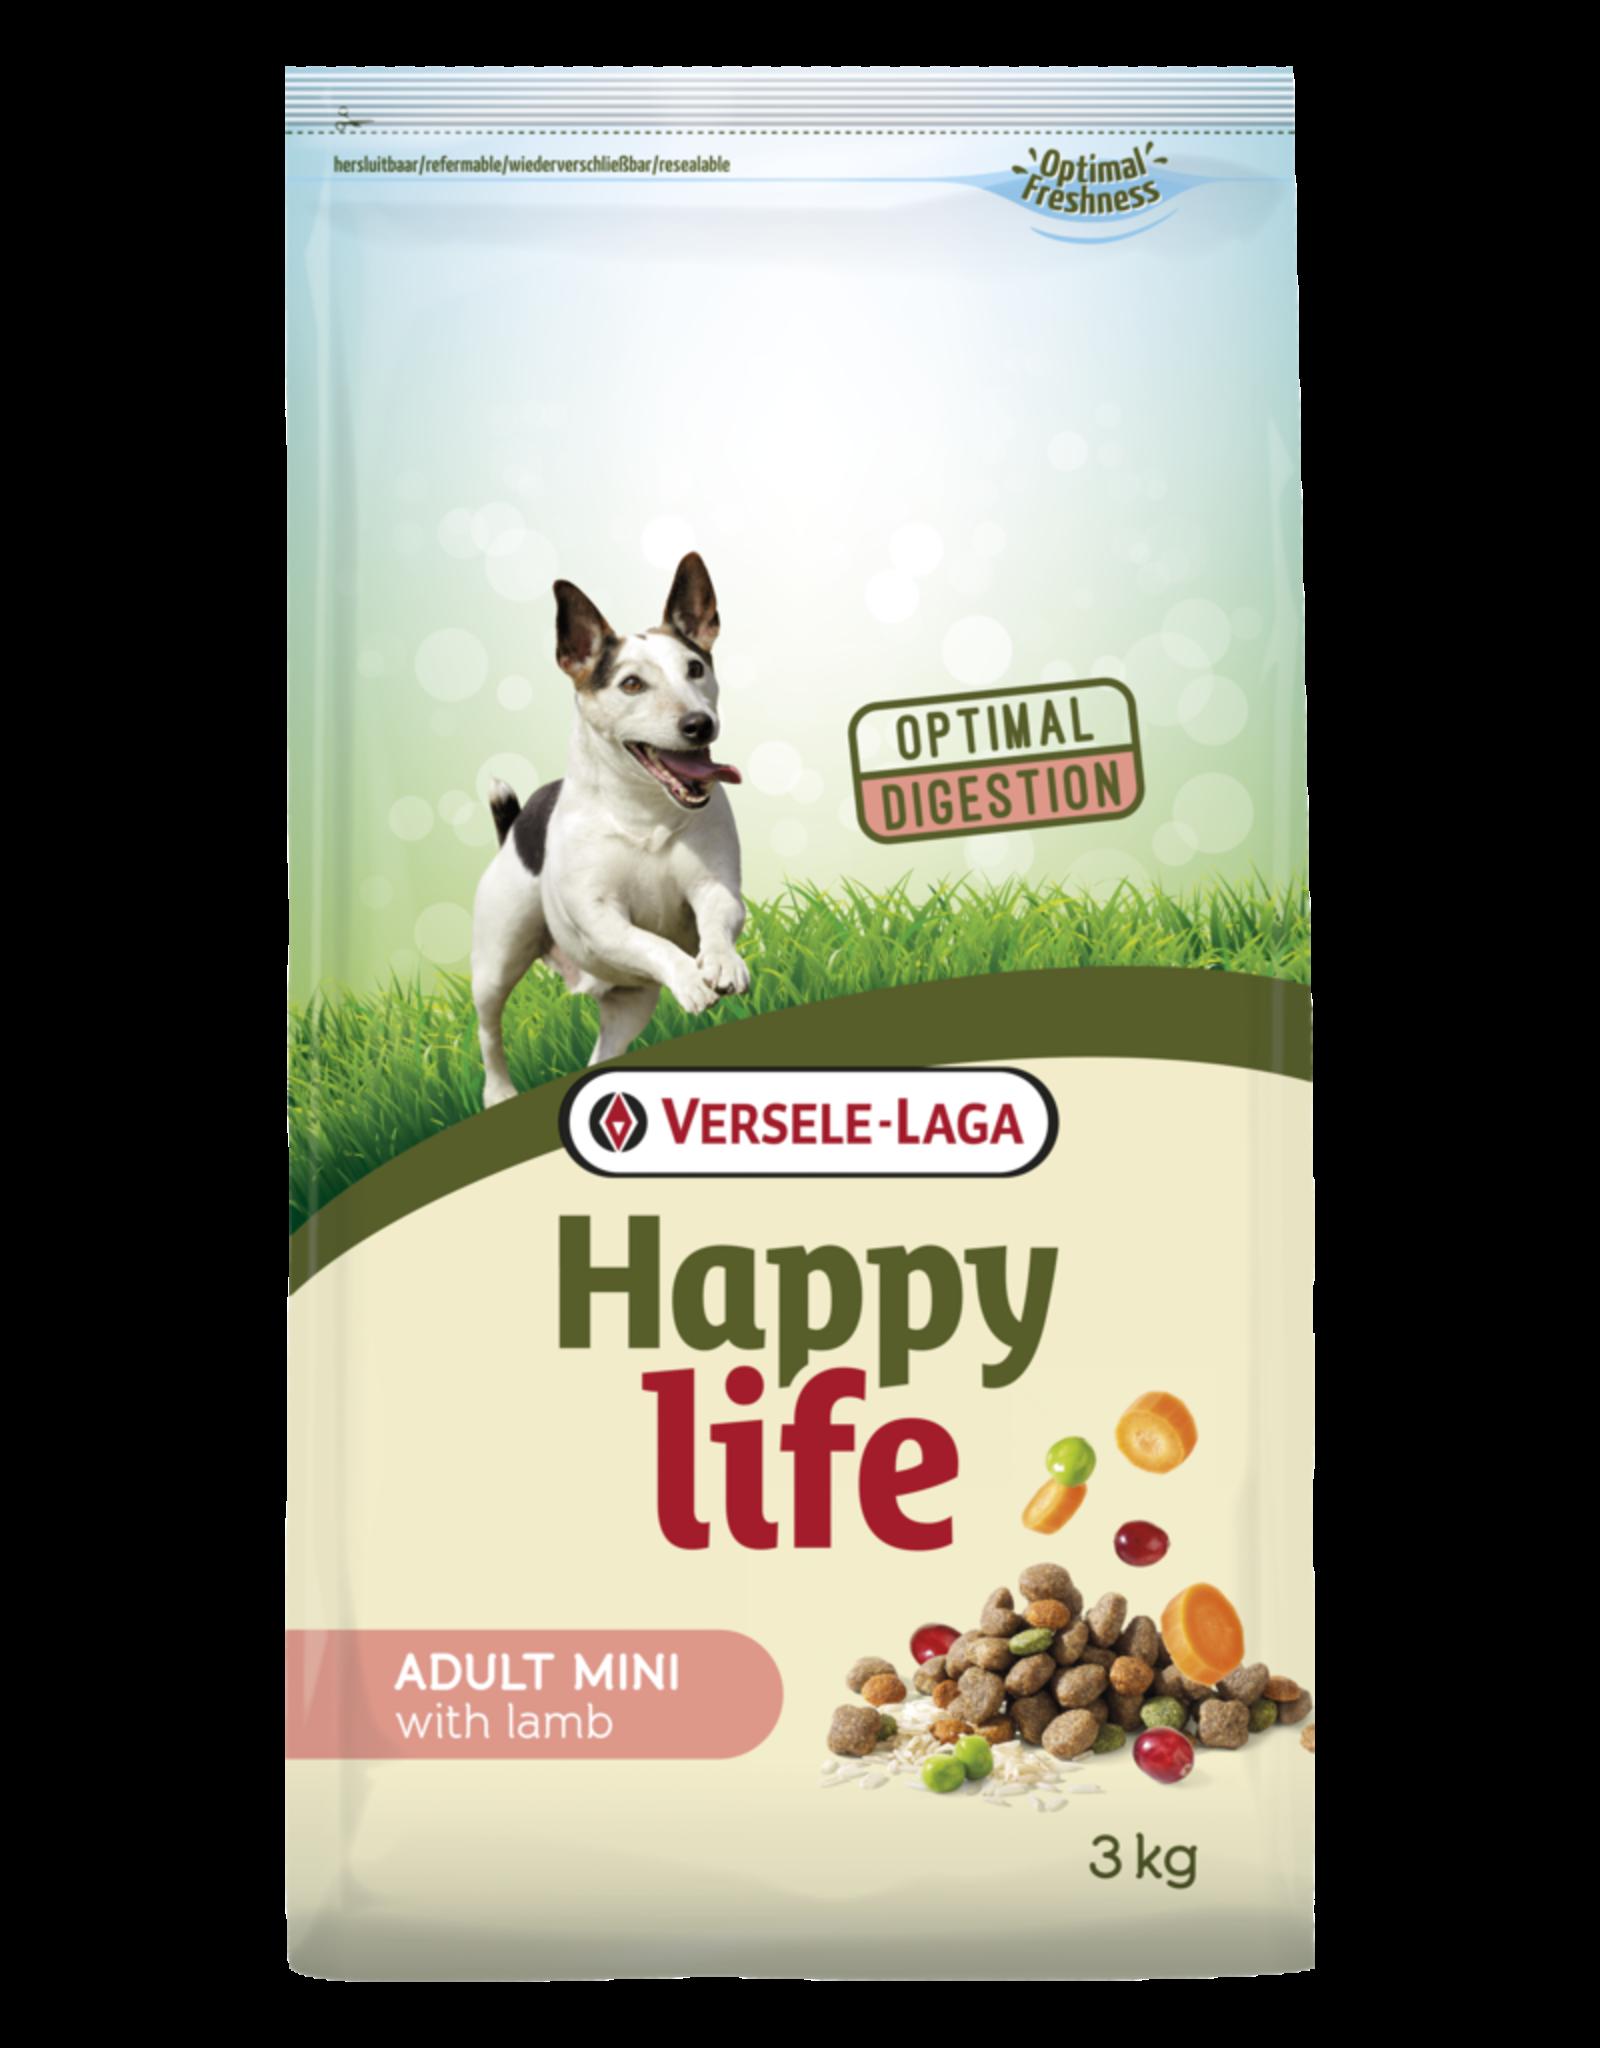 Versele laga happy life adult mini lamb - 3 KG